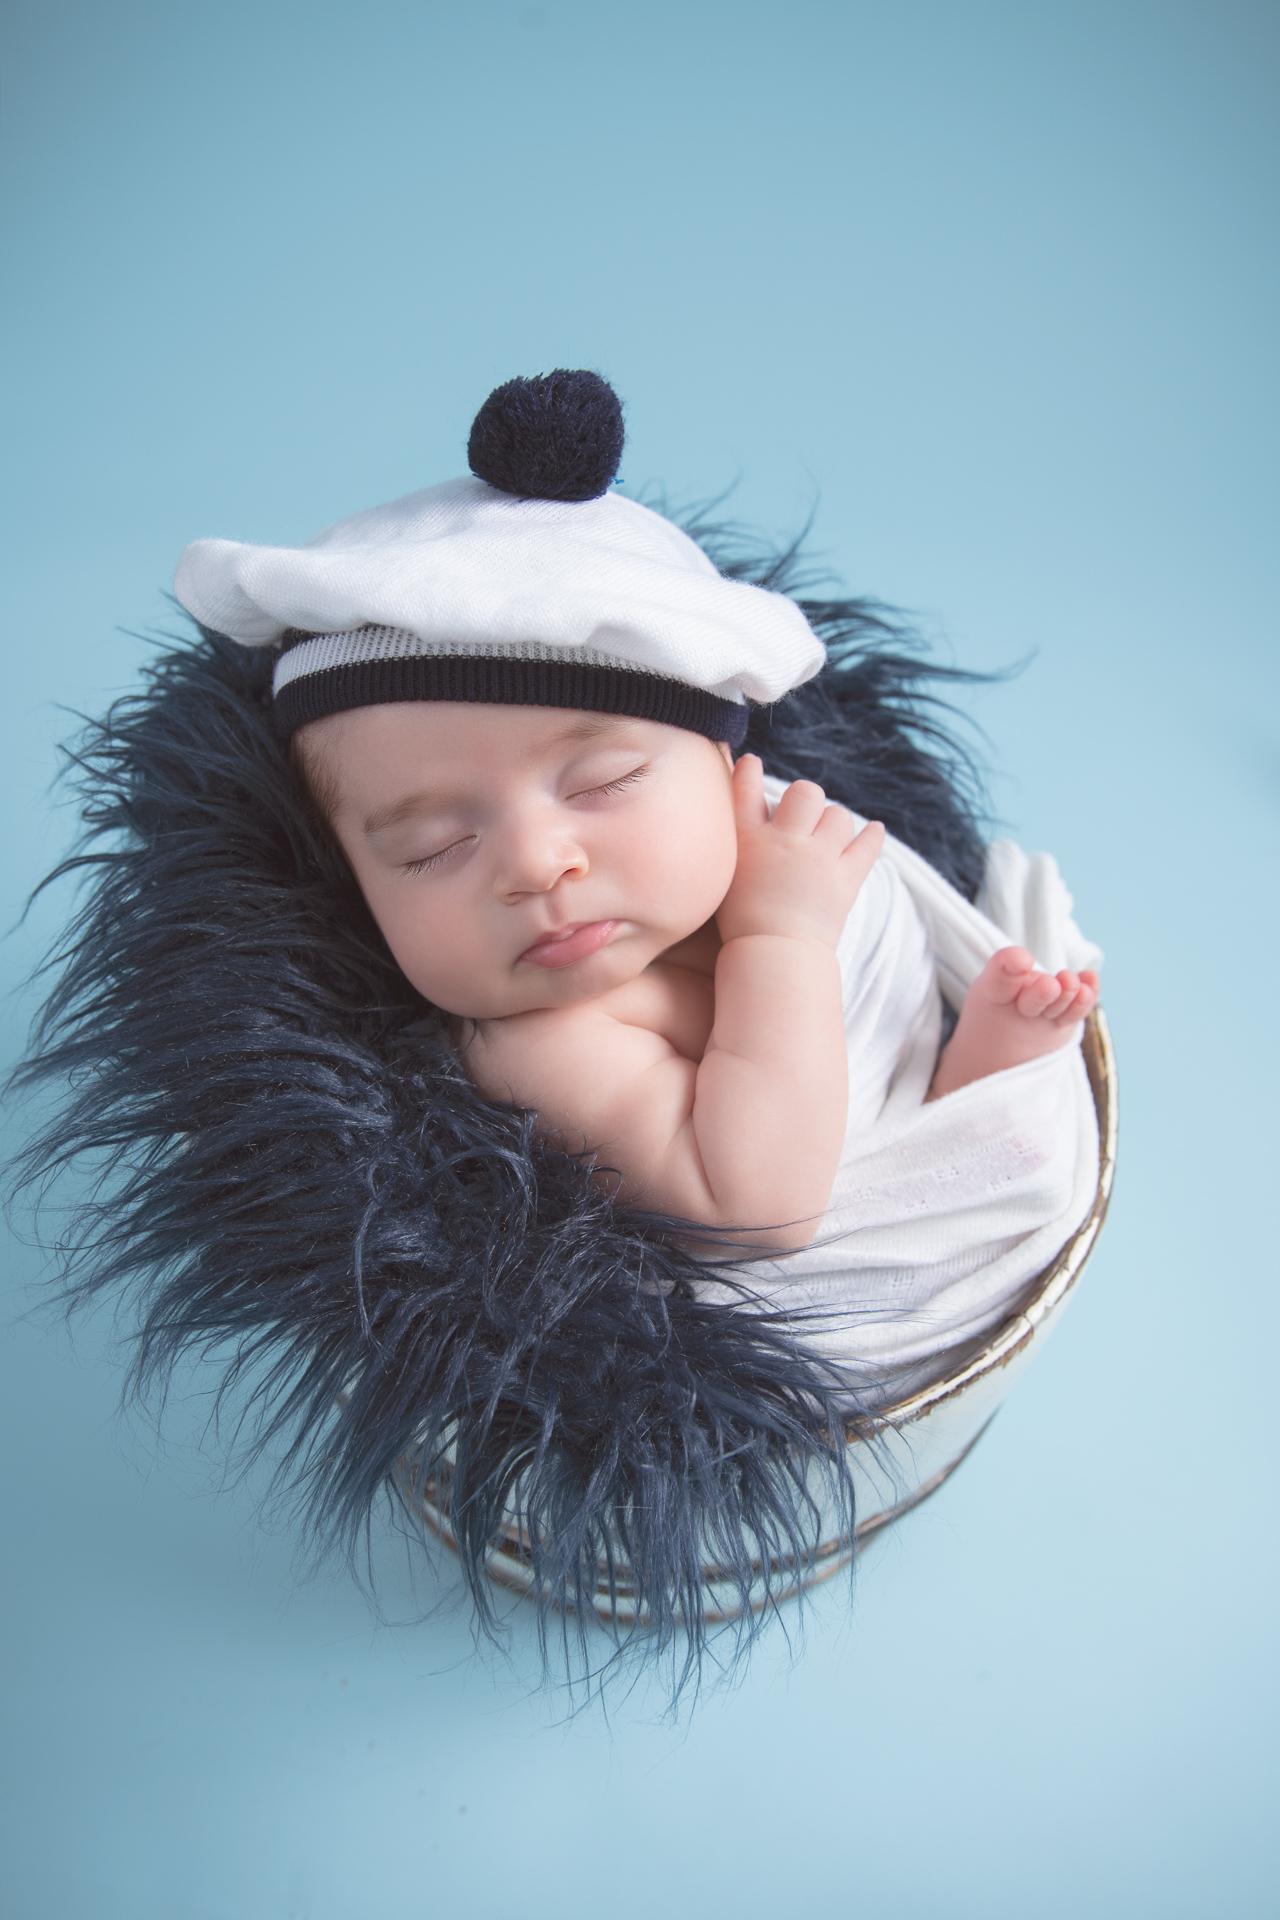 Older newborn rests on round basket prop. Blue backdrop. White and blue hat. White wrap.